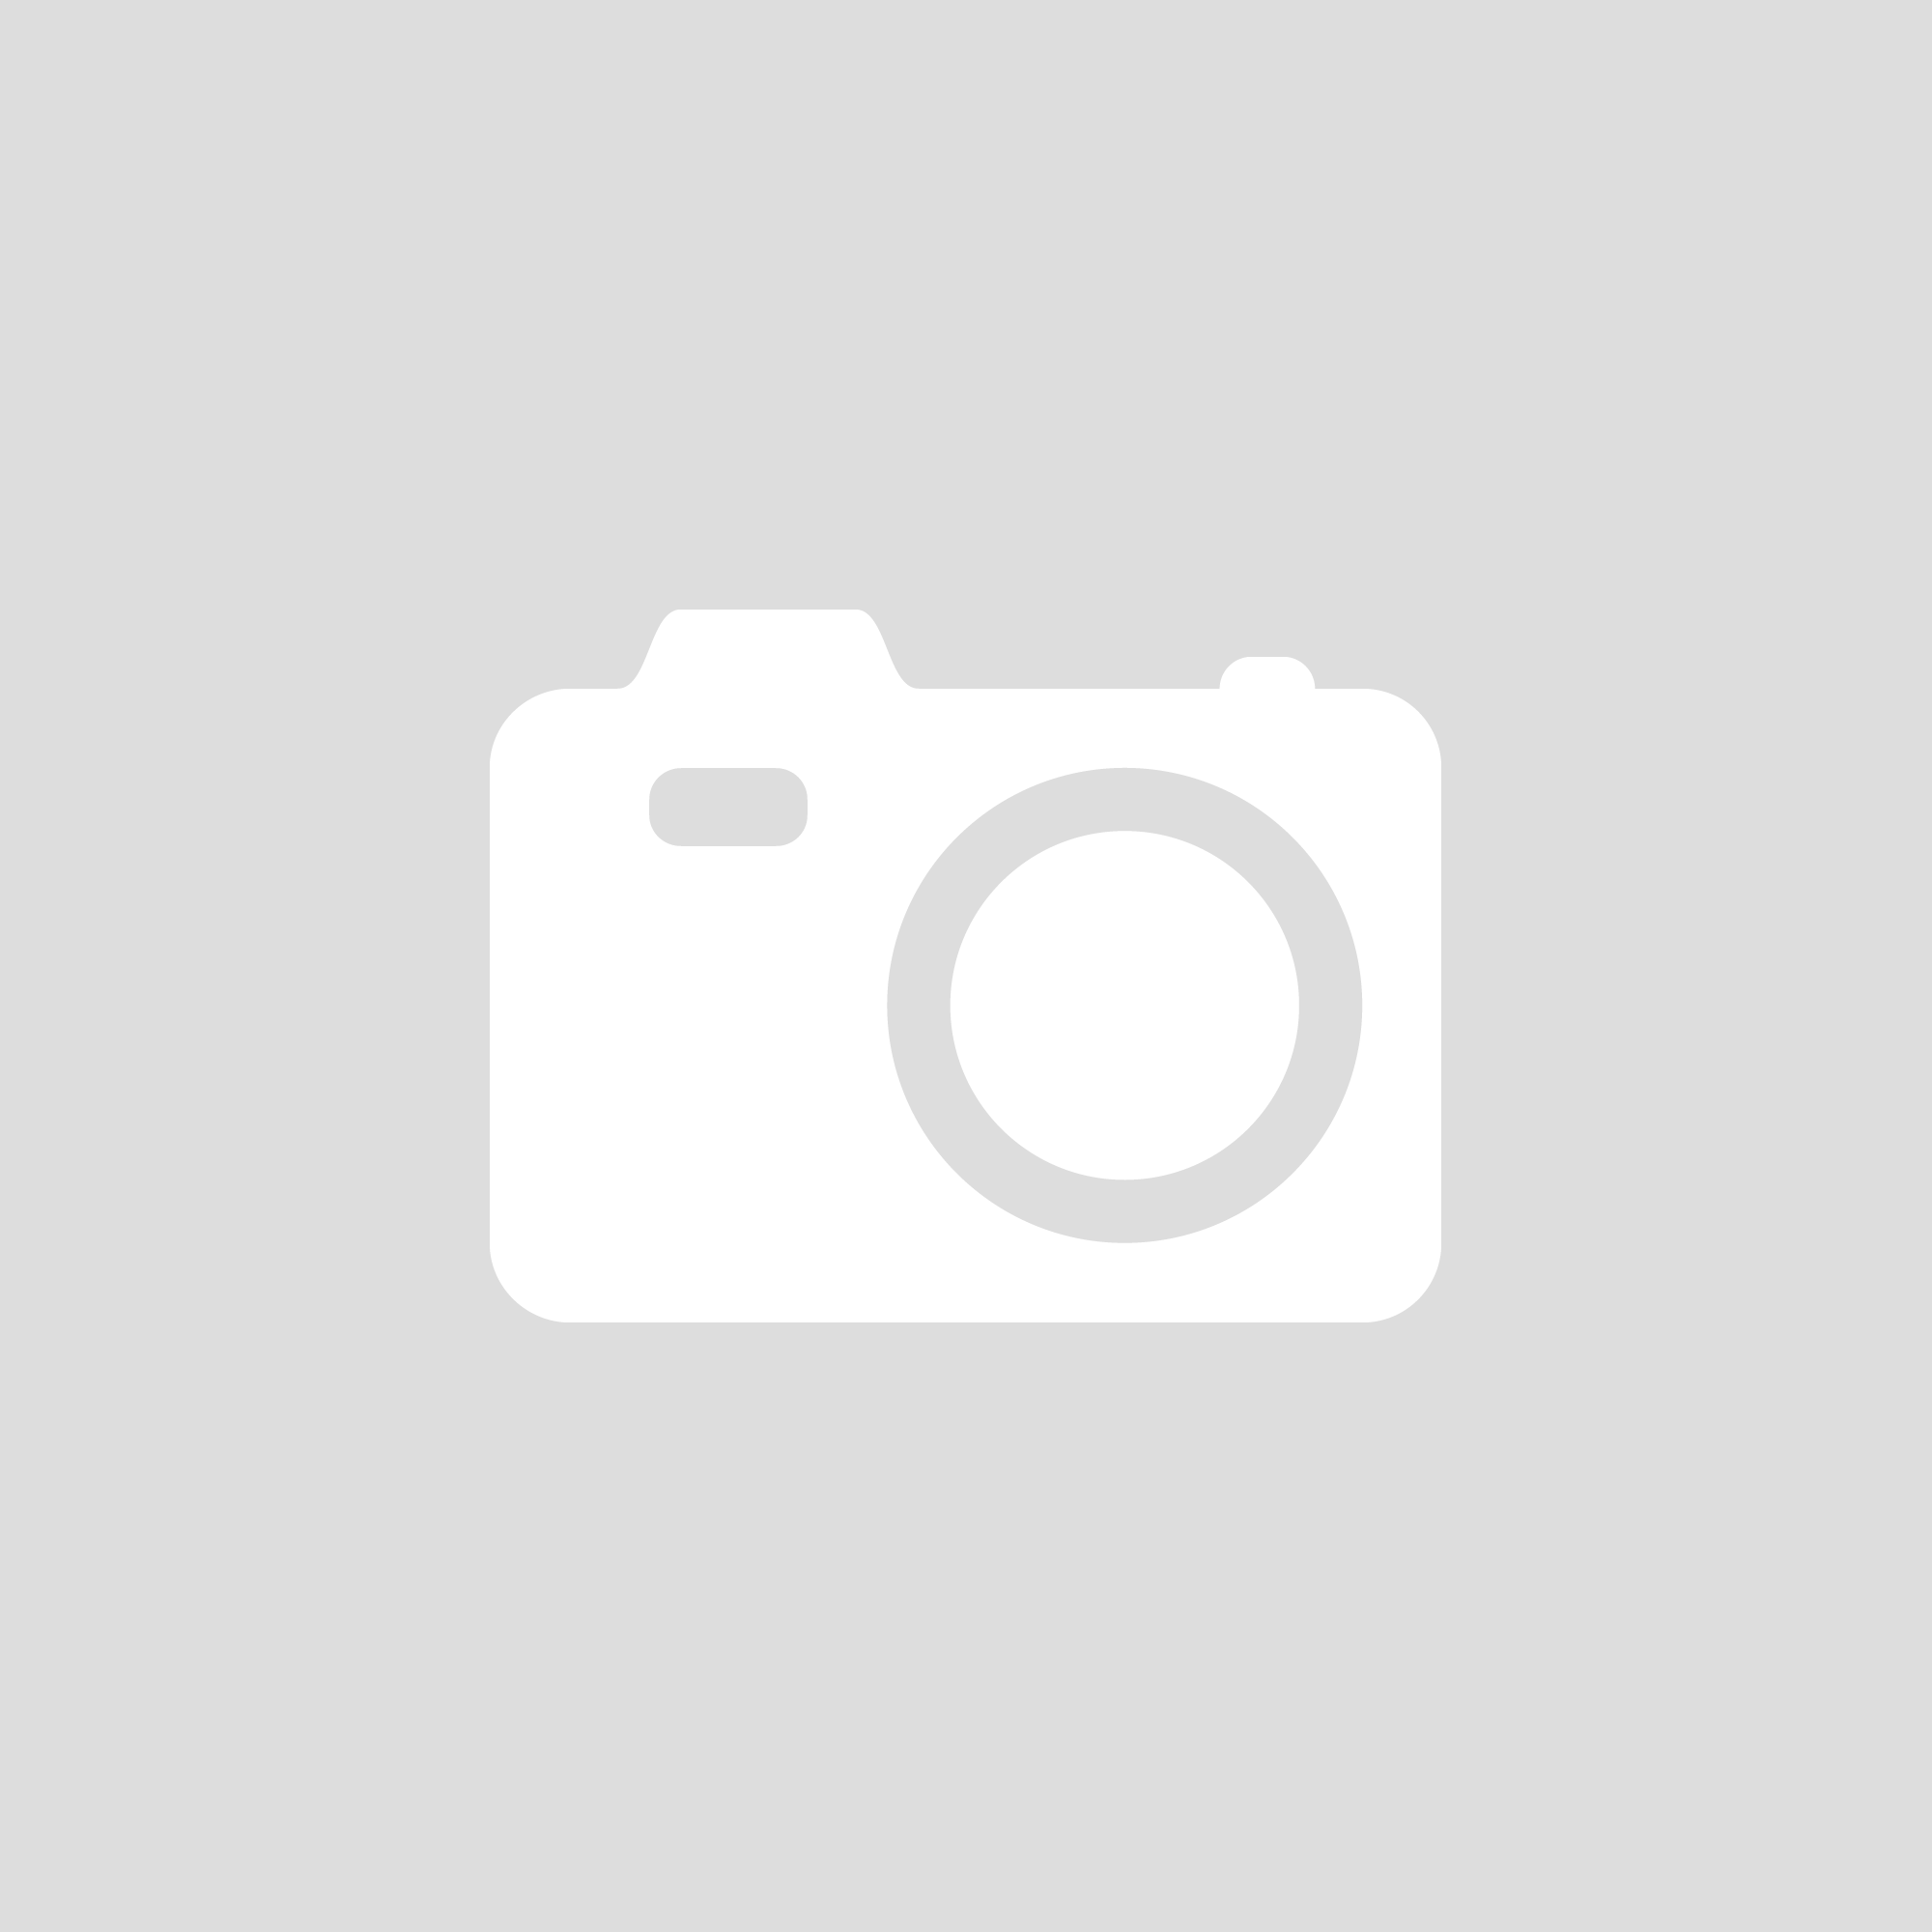 Tiffany Platinum Pink / Beige Wallpaper by Belgravia GB 160